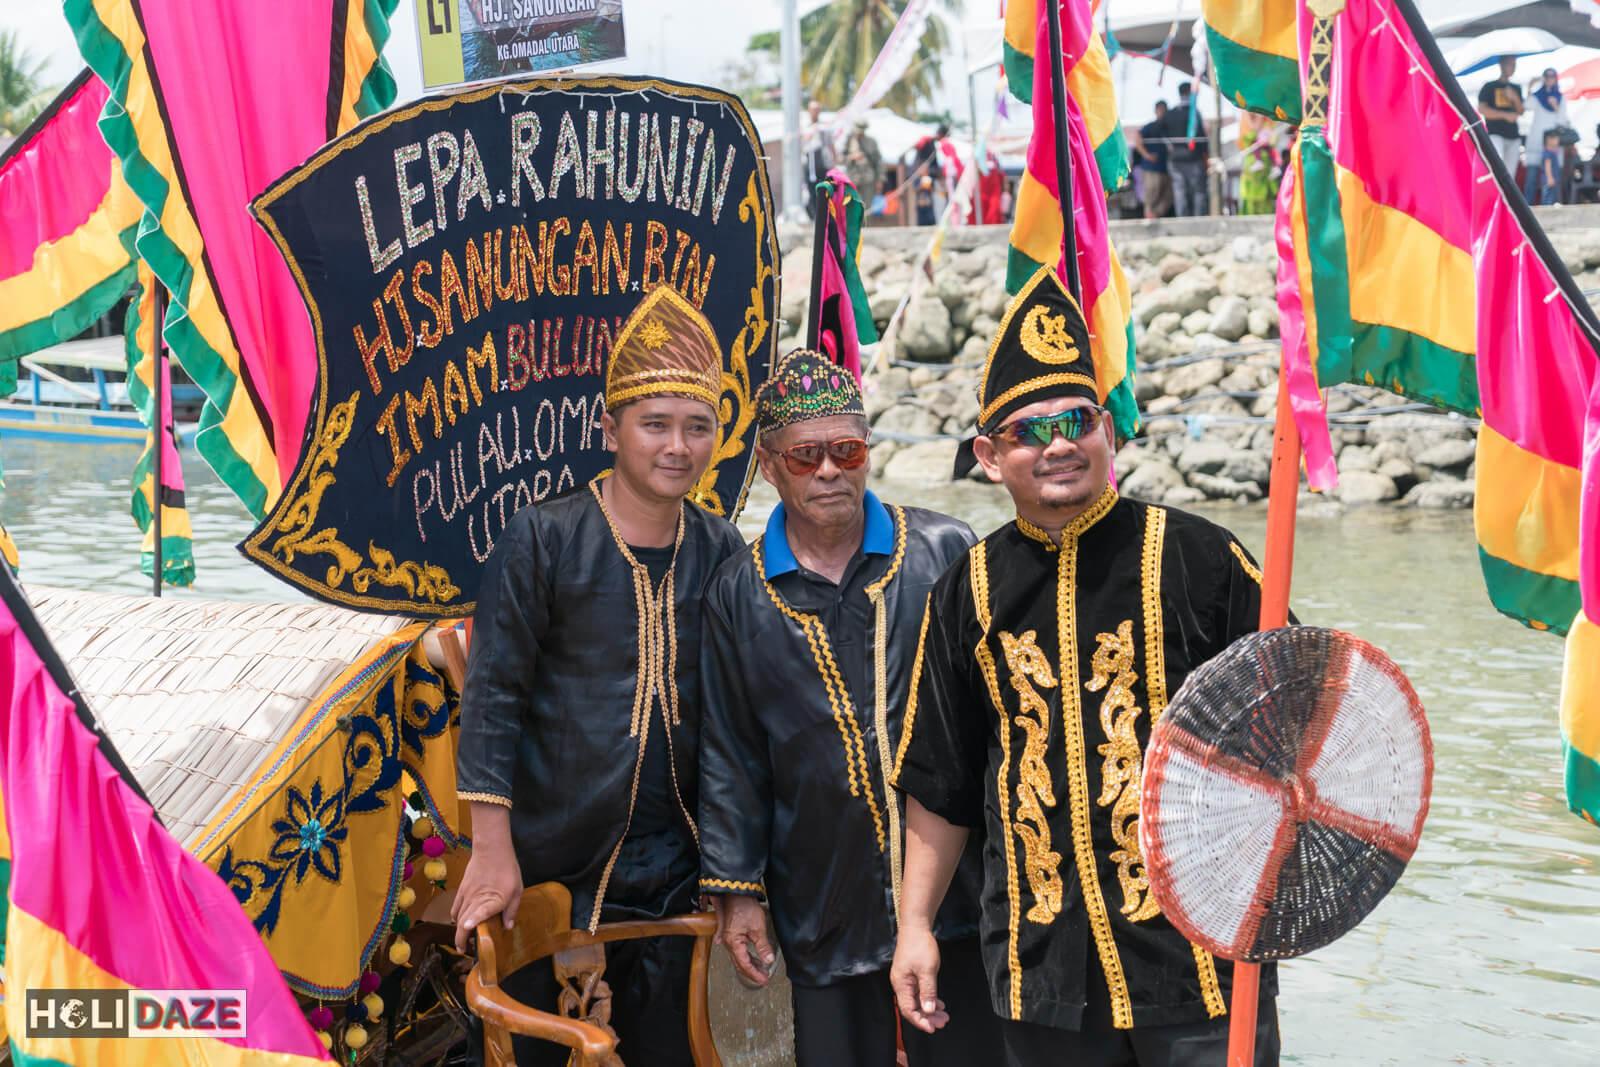 The Regatta Lepa festival in Semporna, Sabah, East Malaysia